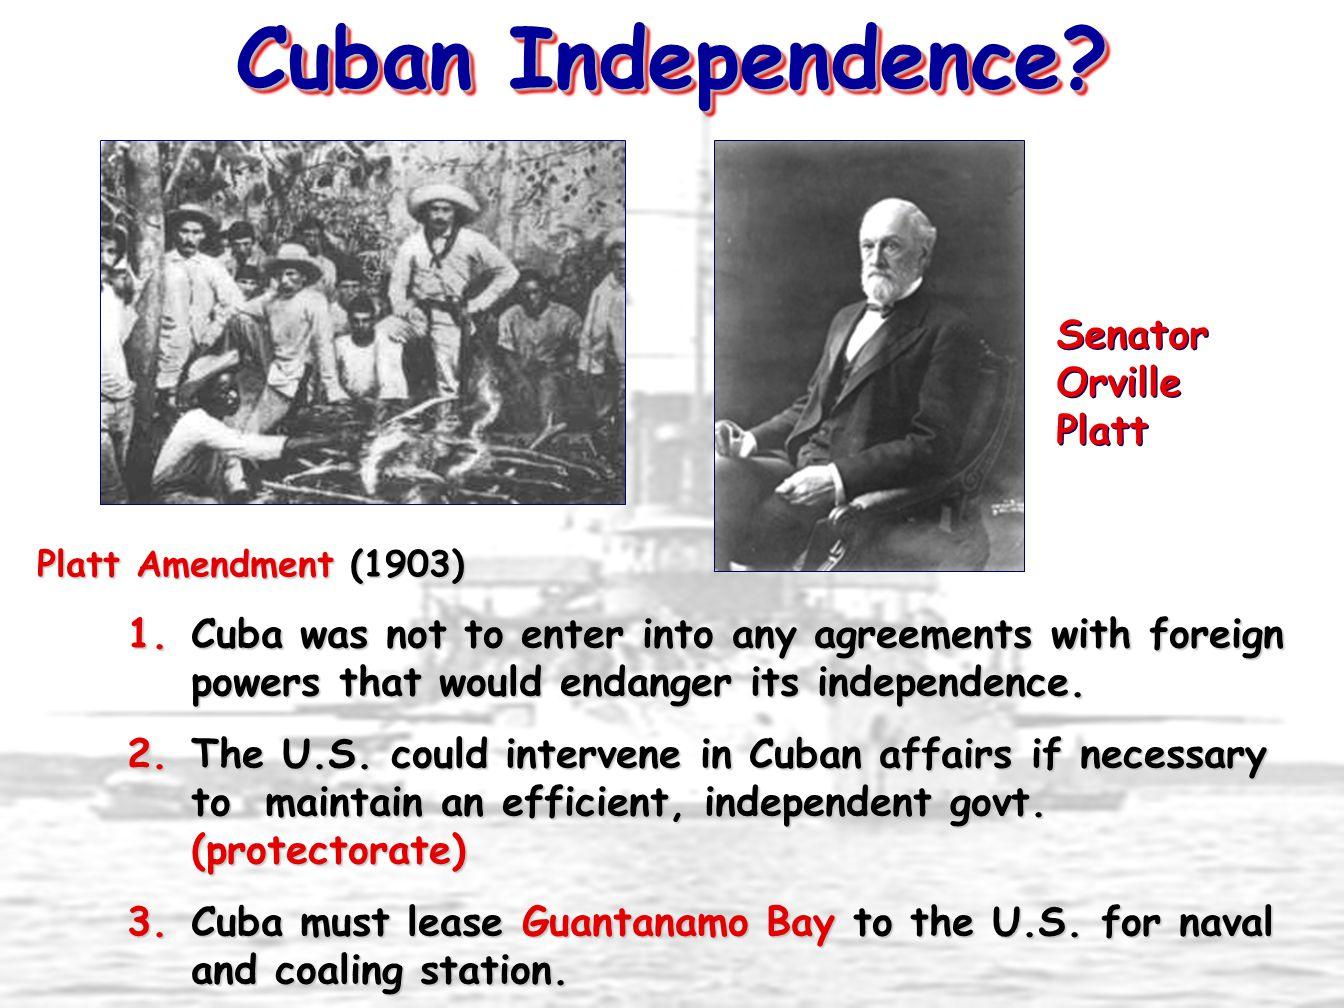 Cuban Independence Senator Orville Platt